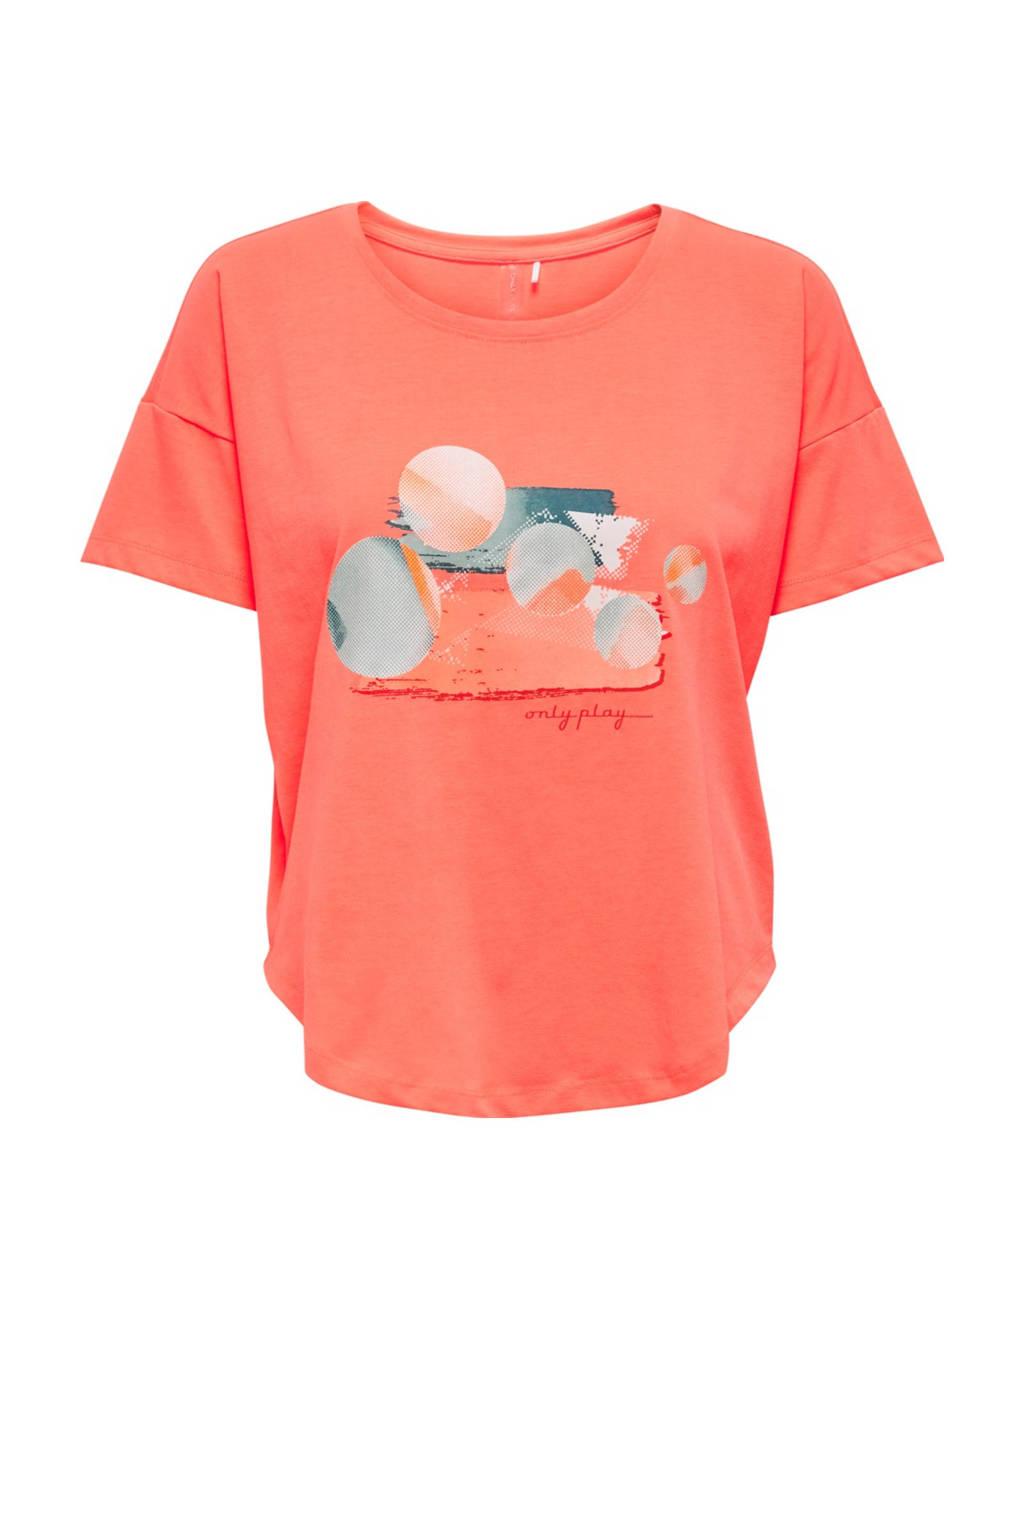 ONLY PLAY sport T-shirt Felipa oranje, Oranje